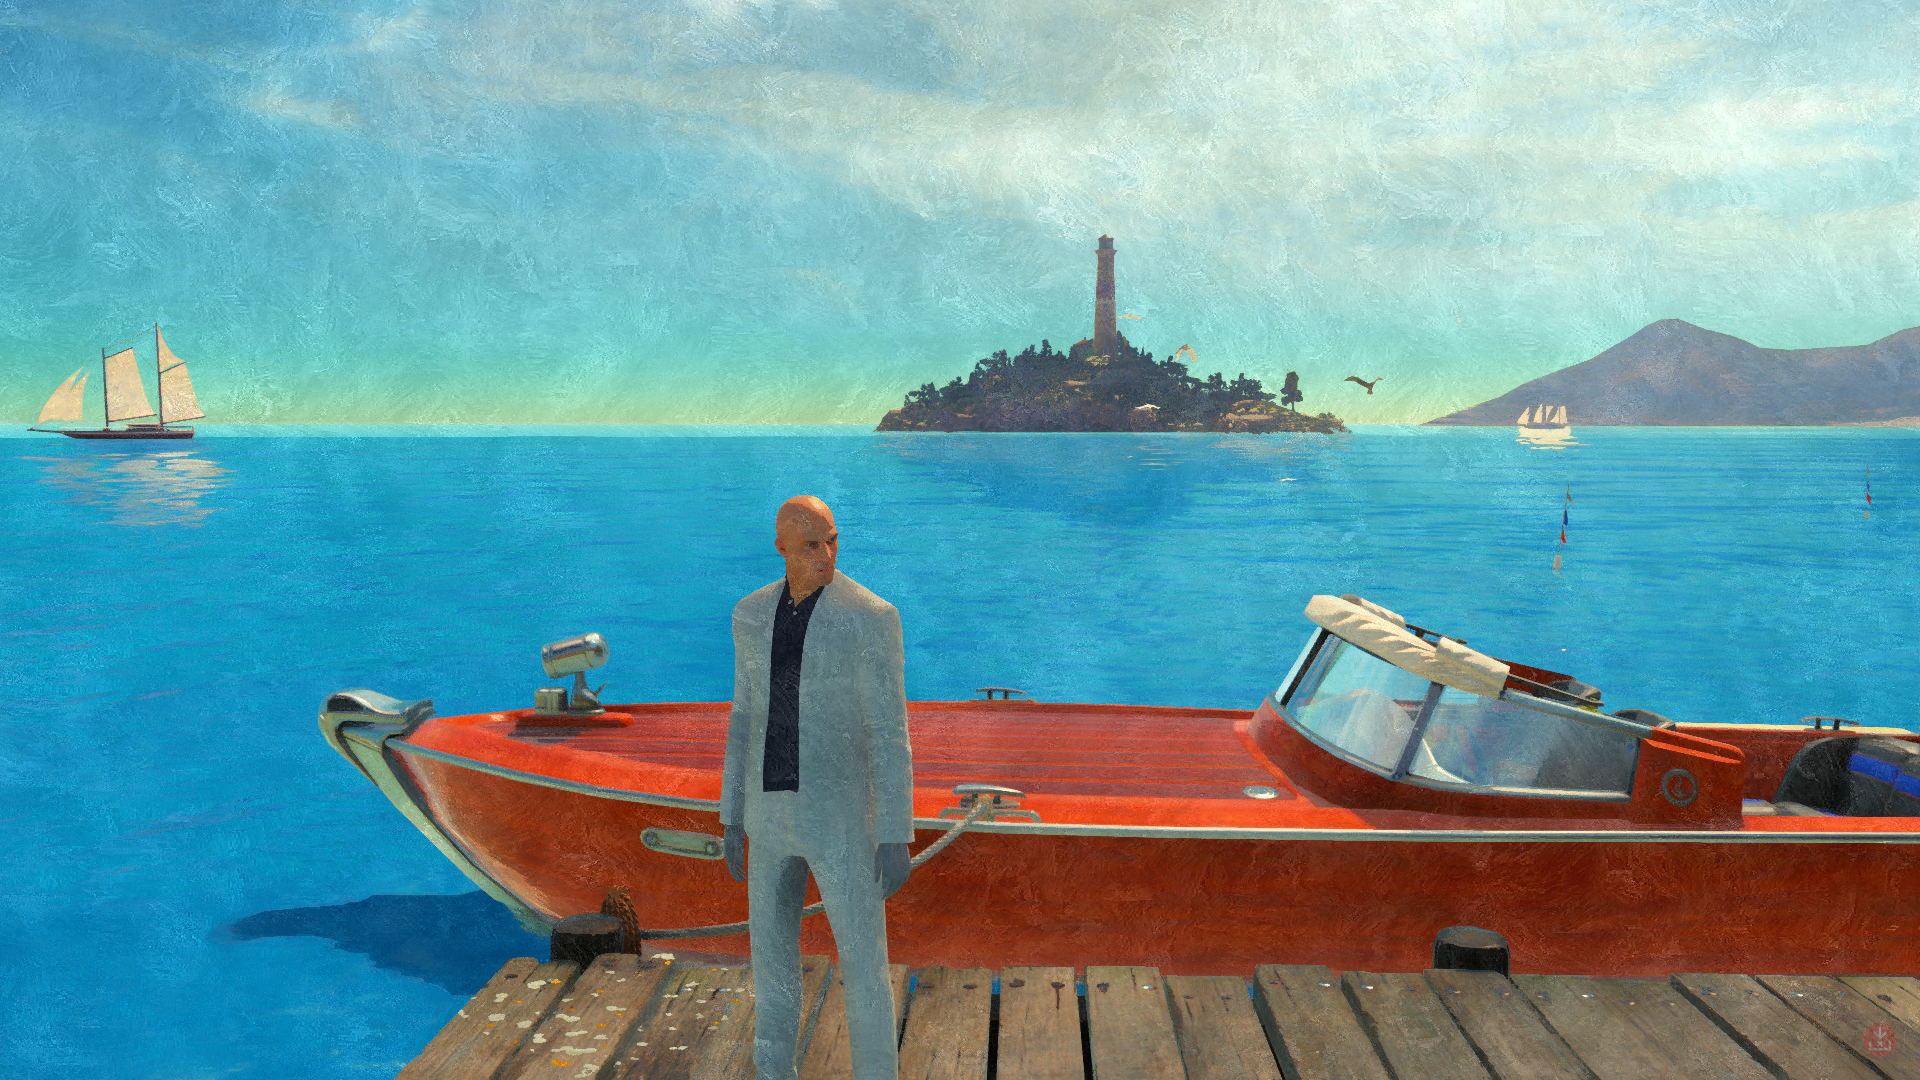 General 1920x1080 Hitman 47 Codename 47 artwork cyan horizon sea red boat island lighthouse birds pier bald head suits sunlight video game art